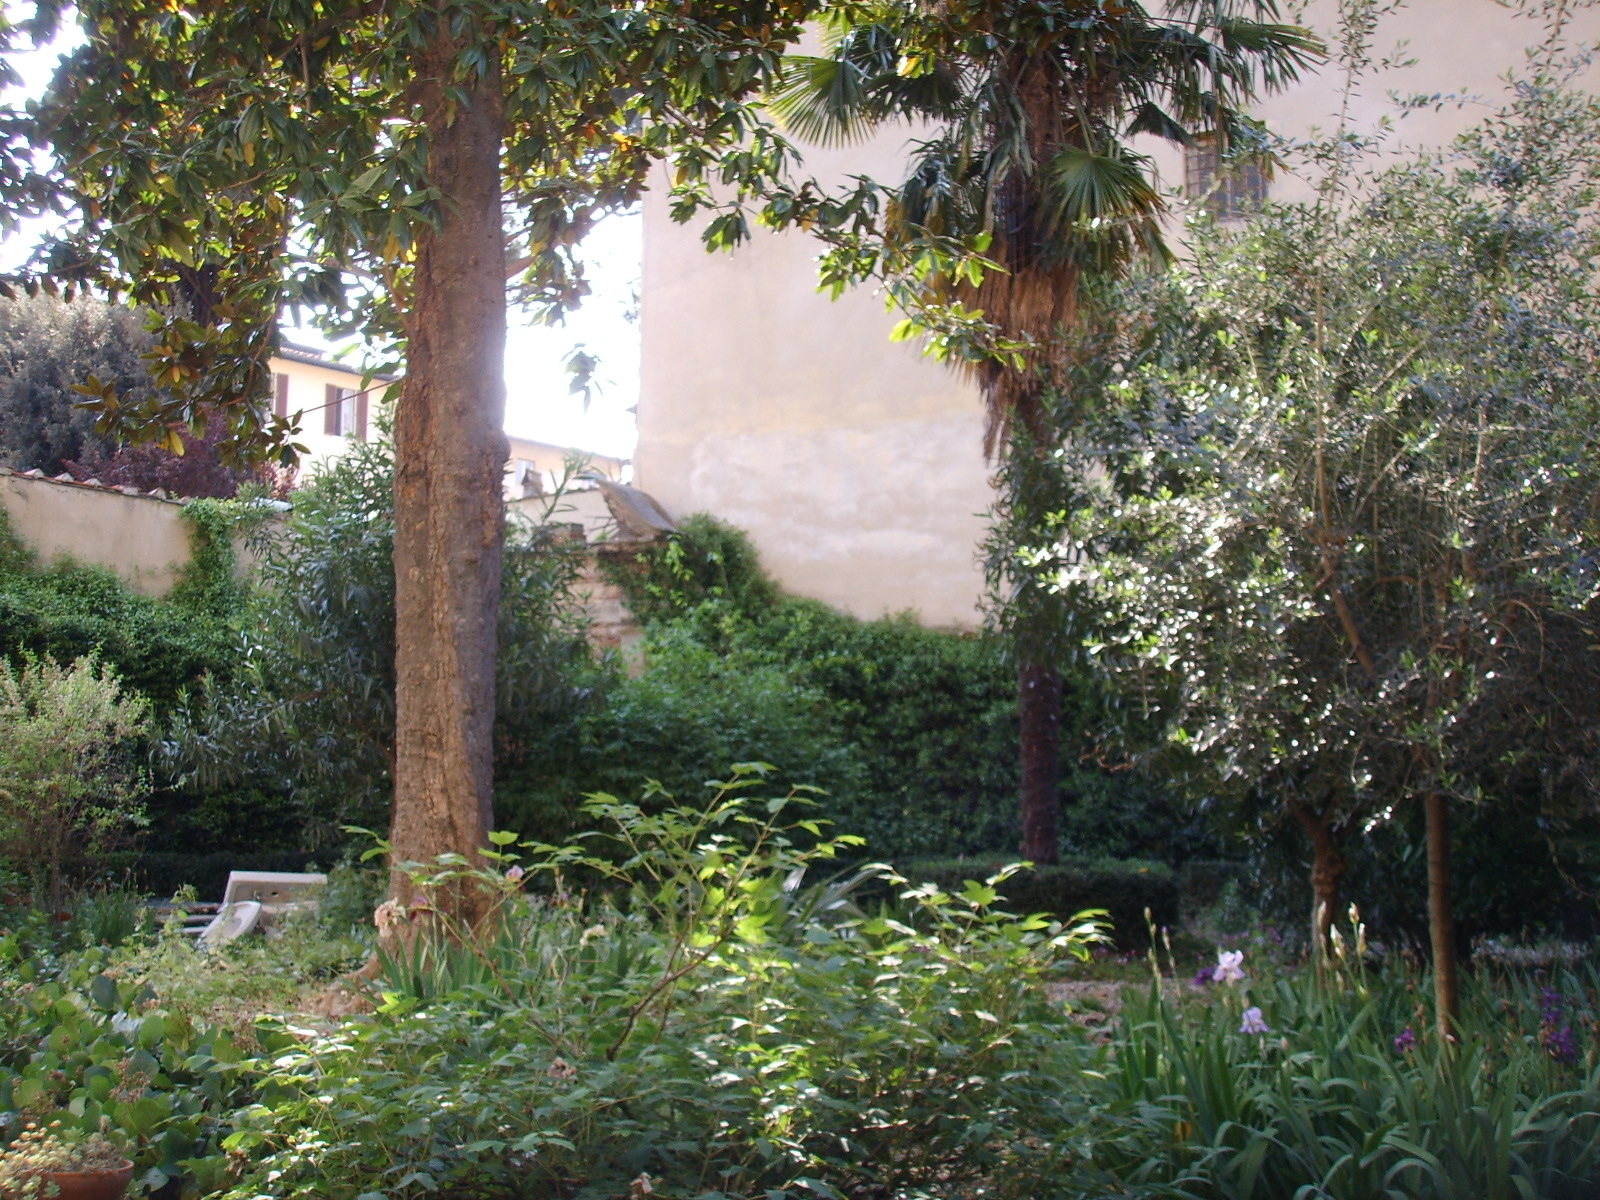 Palazzo_Roffia_giardino_06.JPG